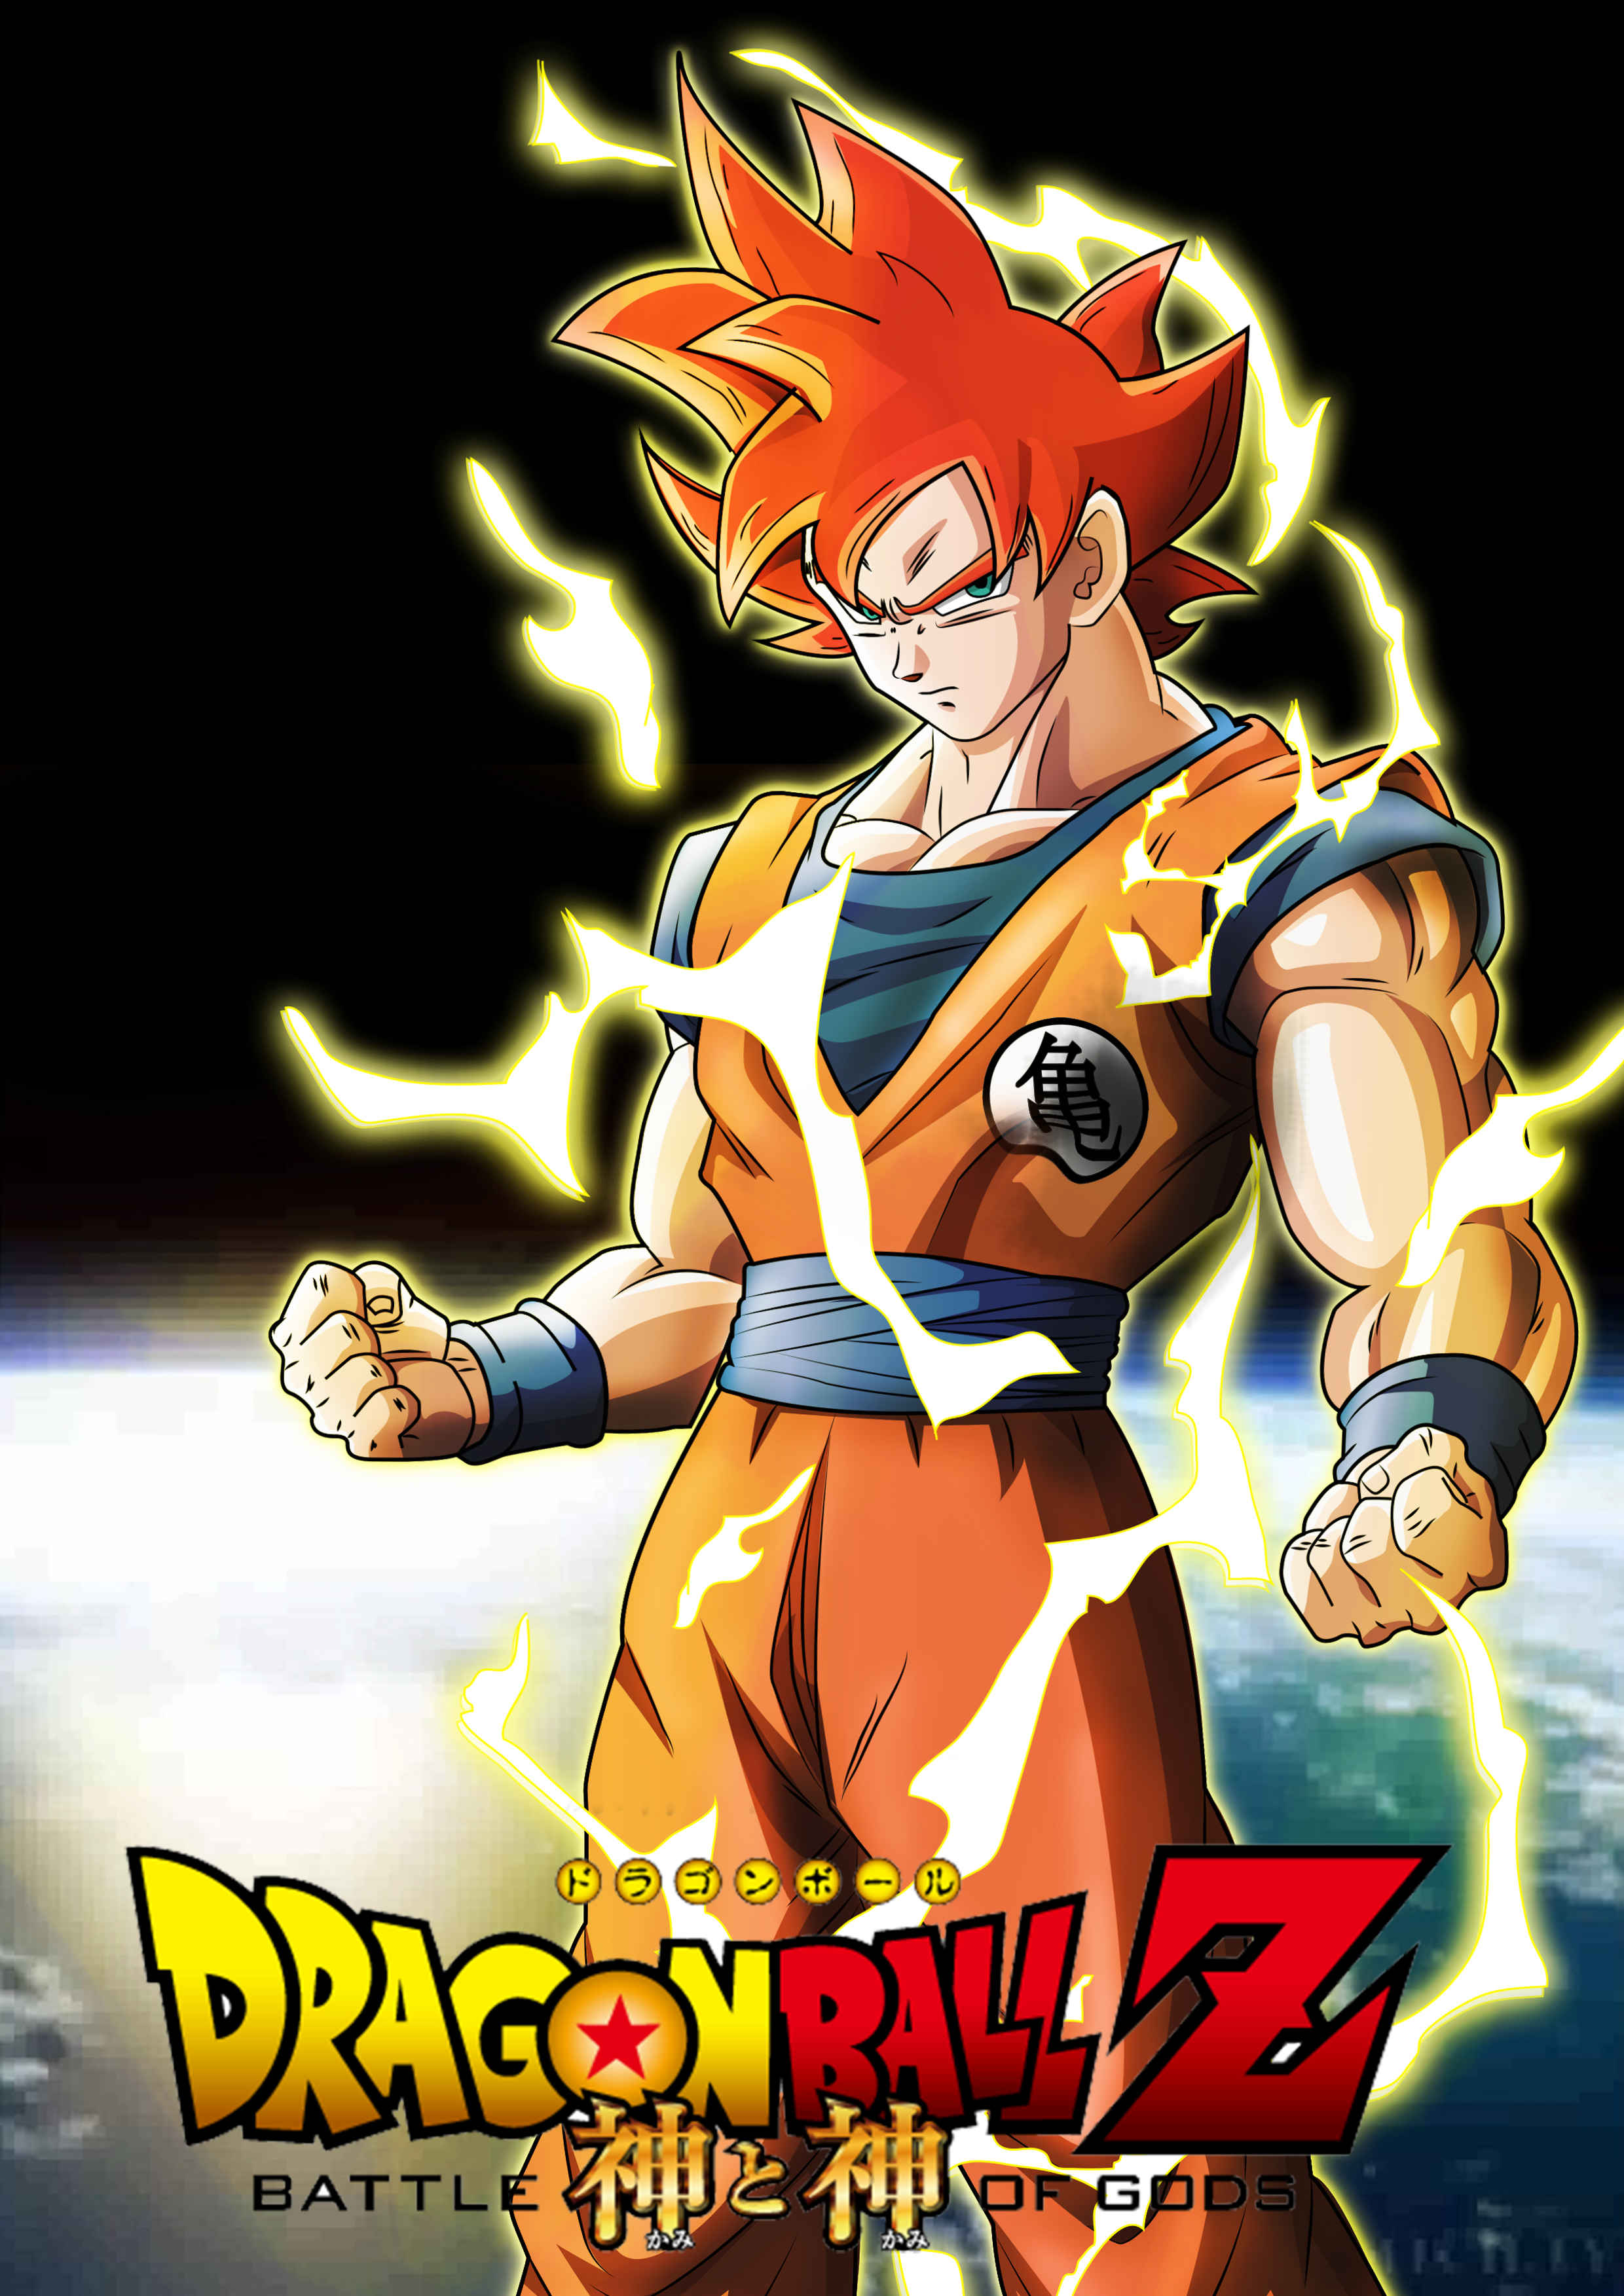 Super Saiyan God mode